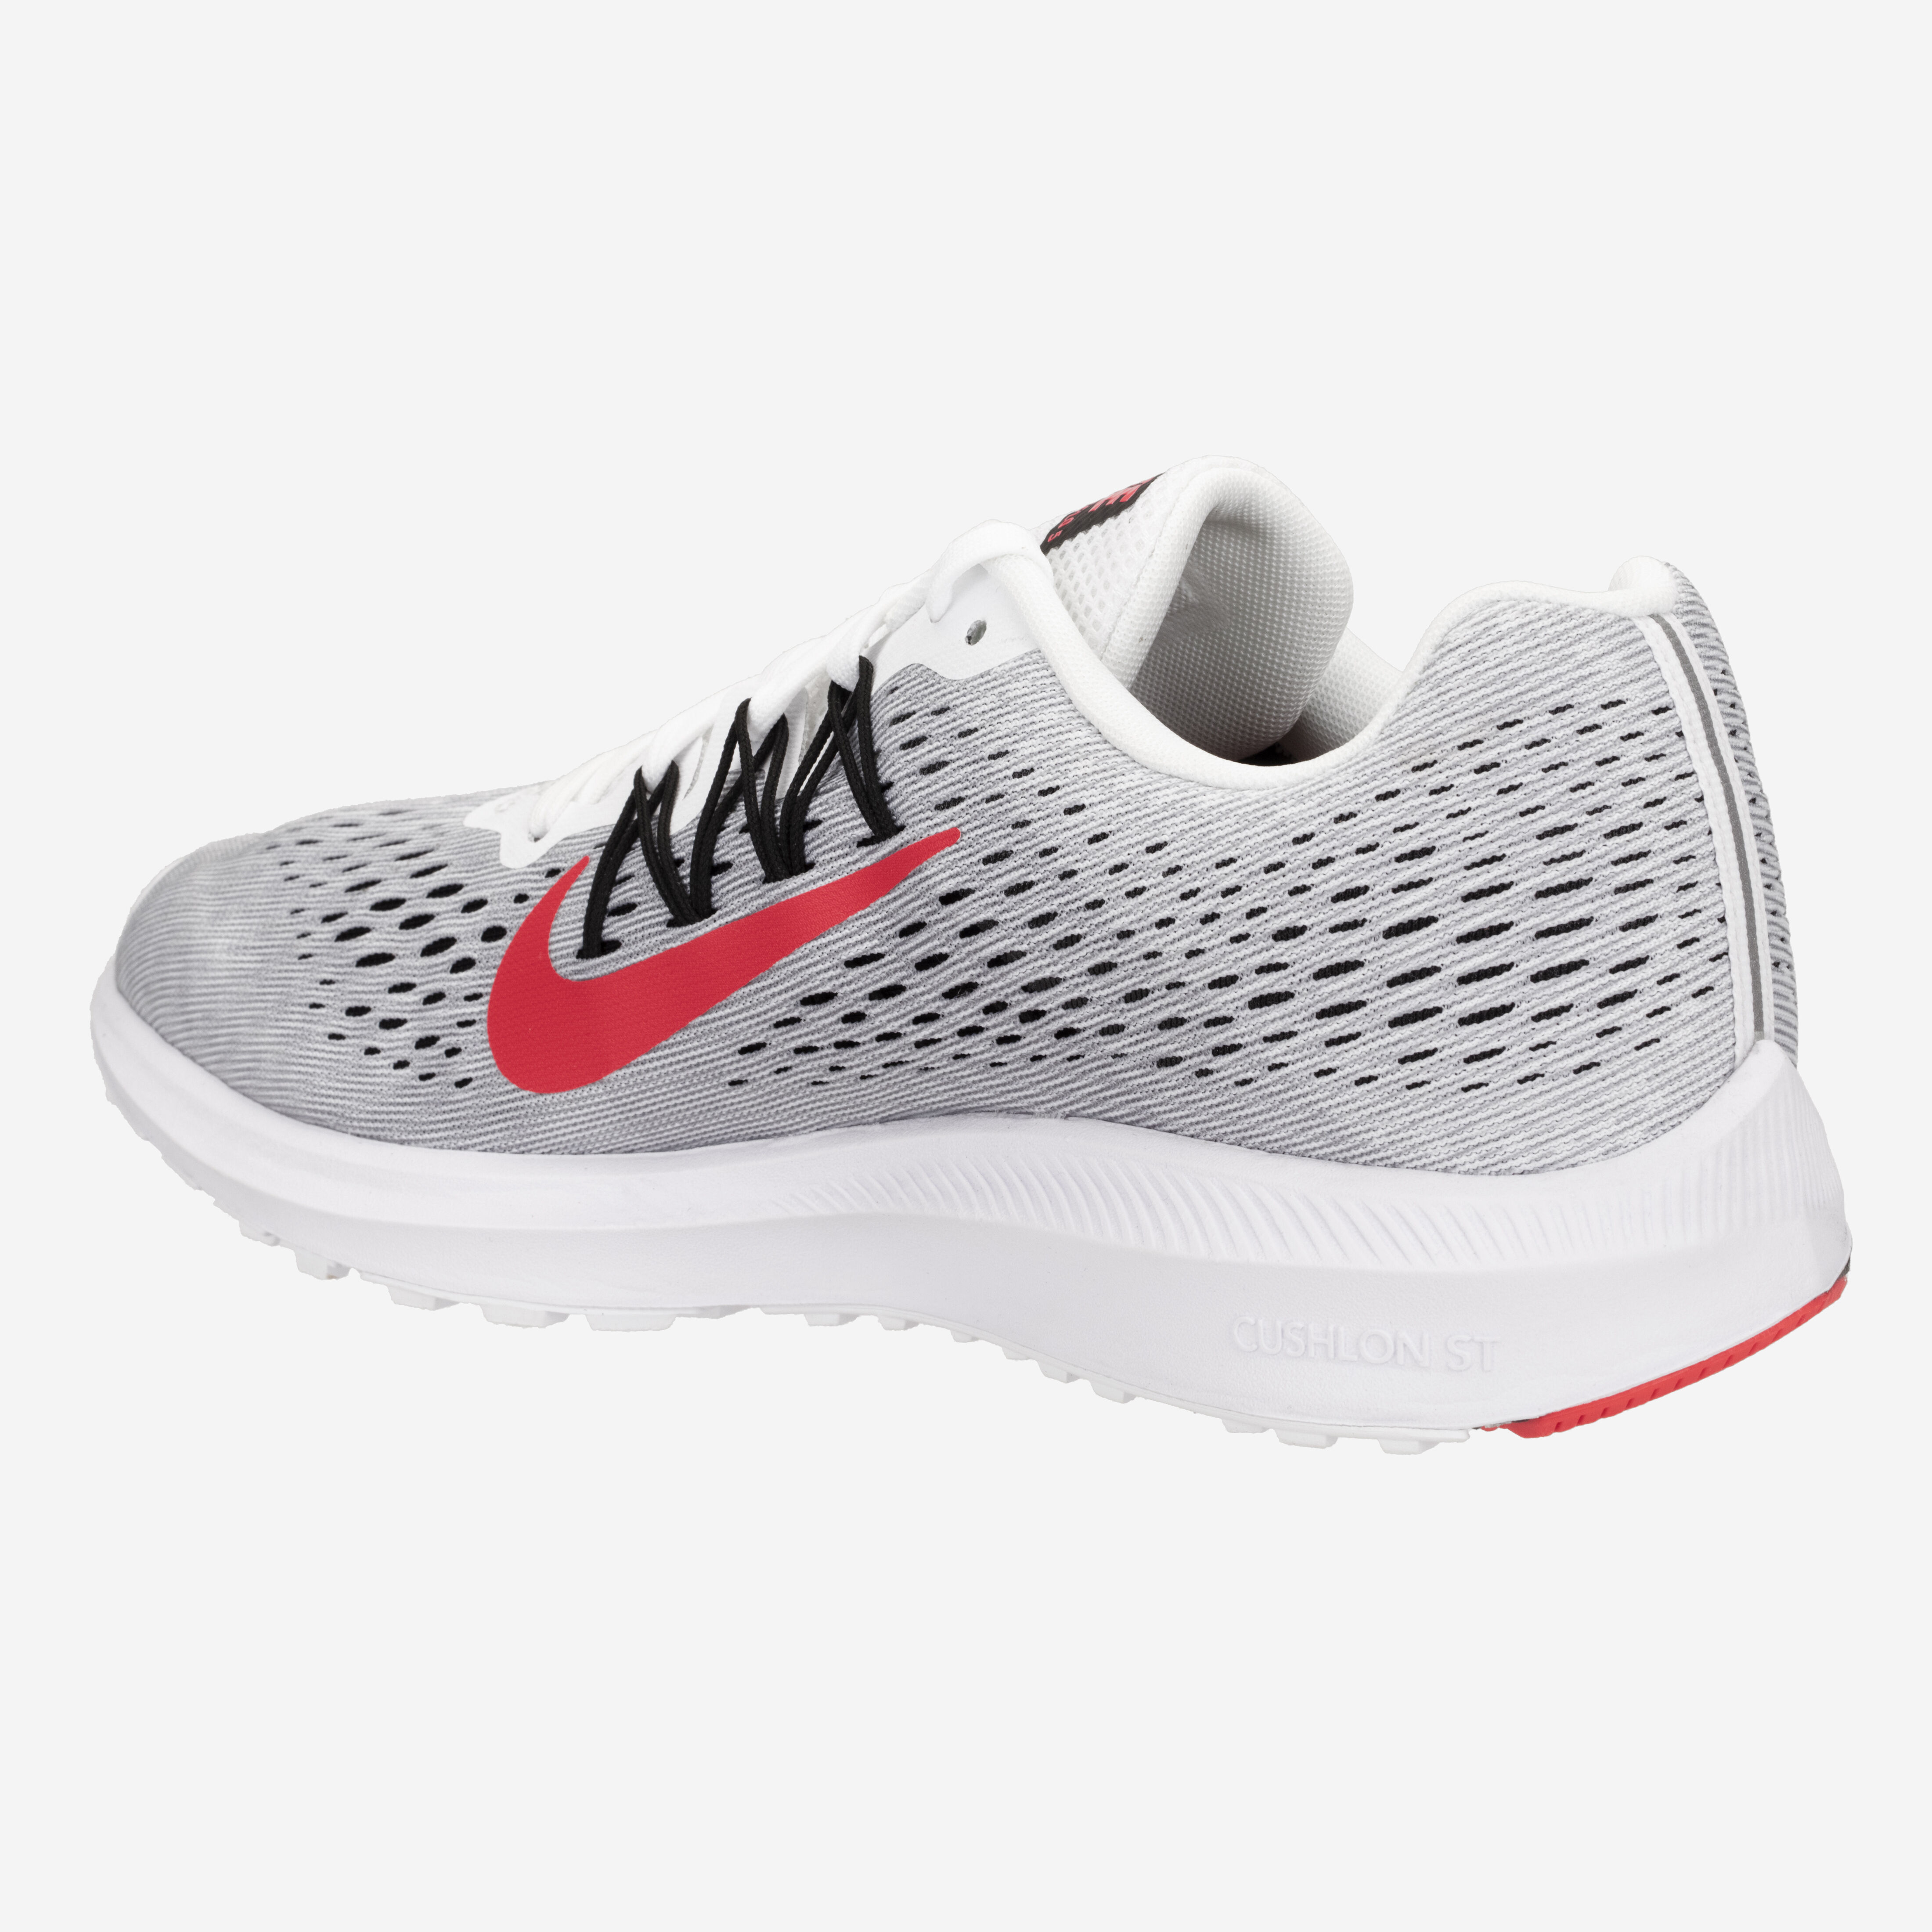 timeless design 6a382 a9d61 Nike Zoom Winflo 5